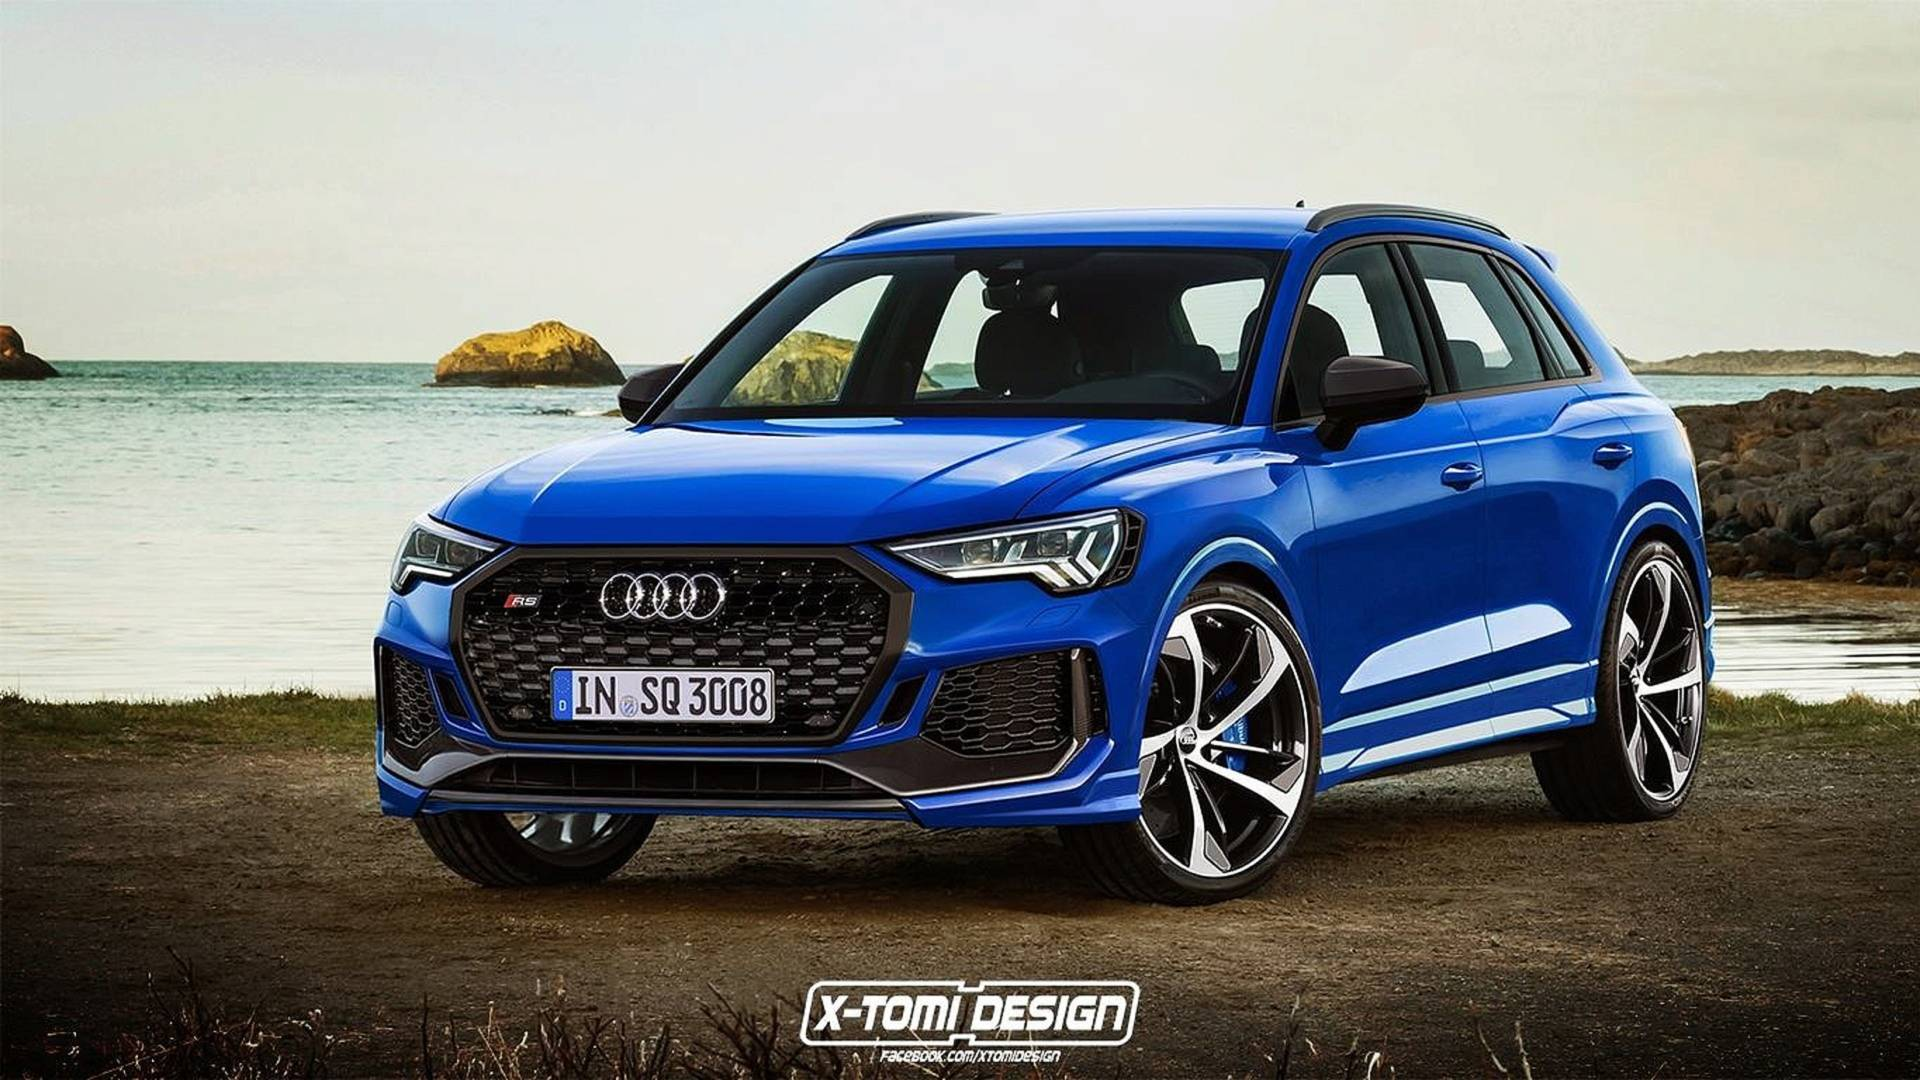 2019 Audi Q3 Rendered In Rs Trim Looks Freaking Fantastic